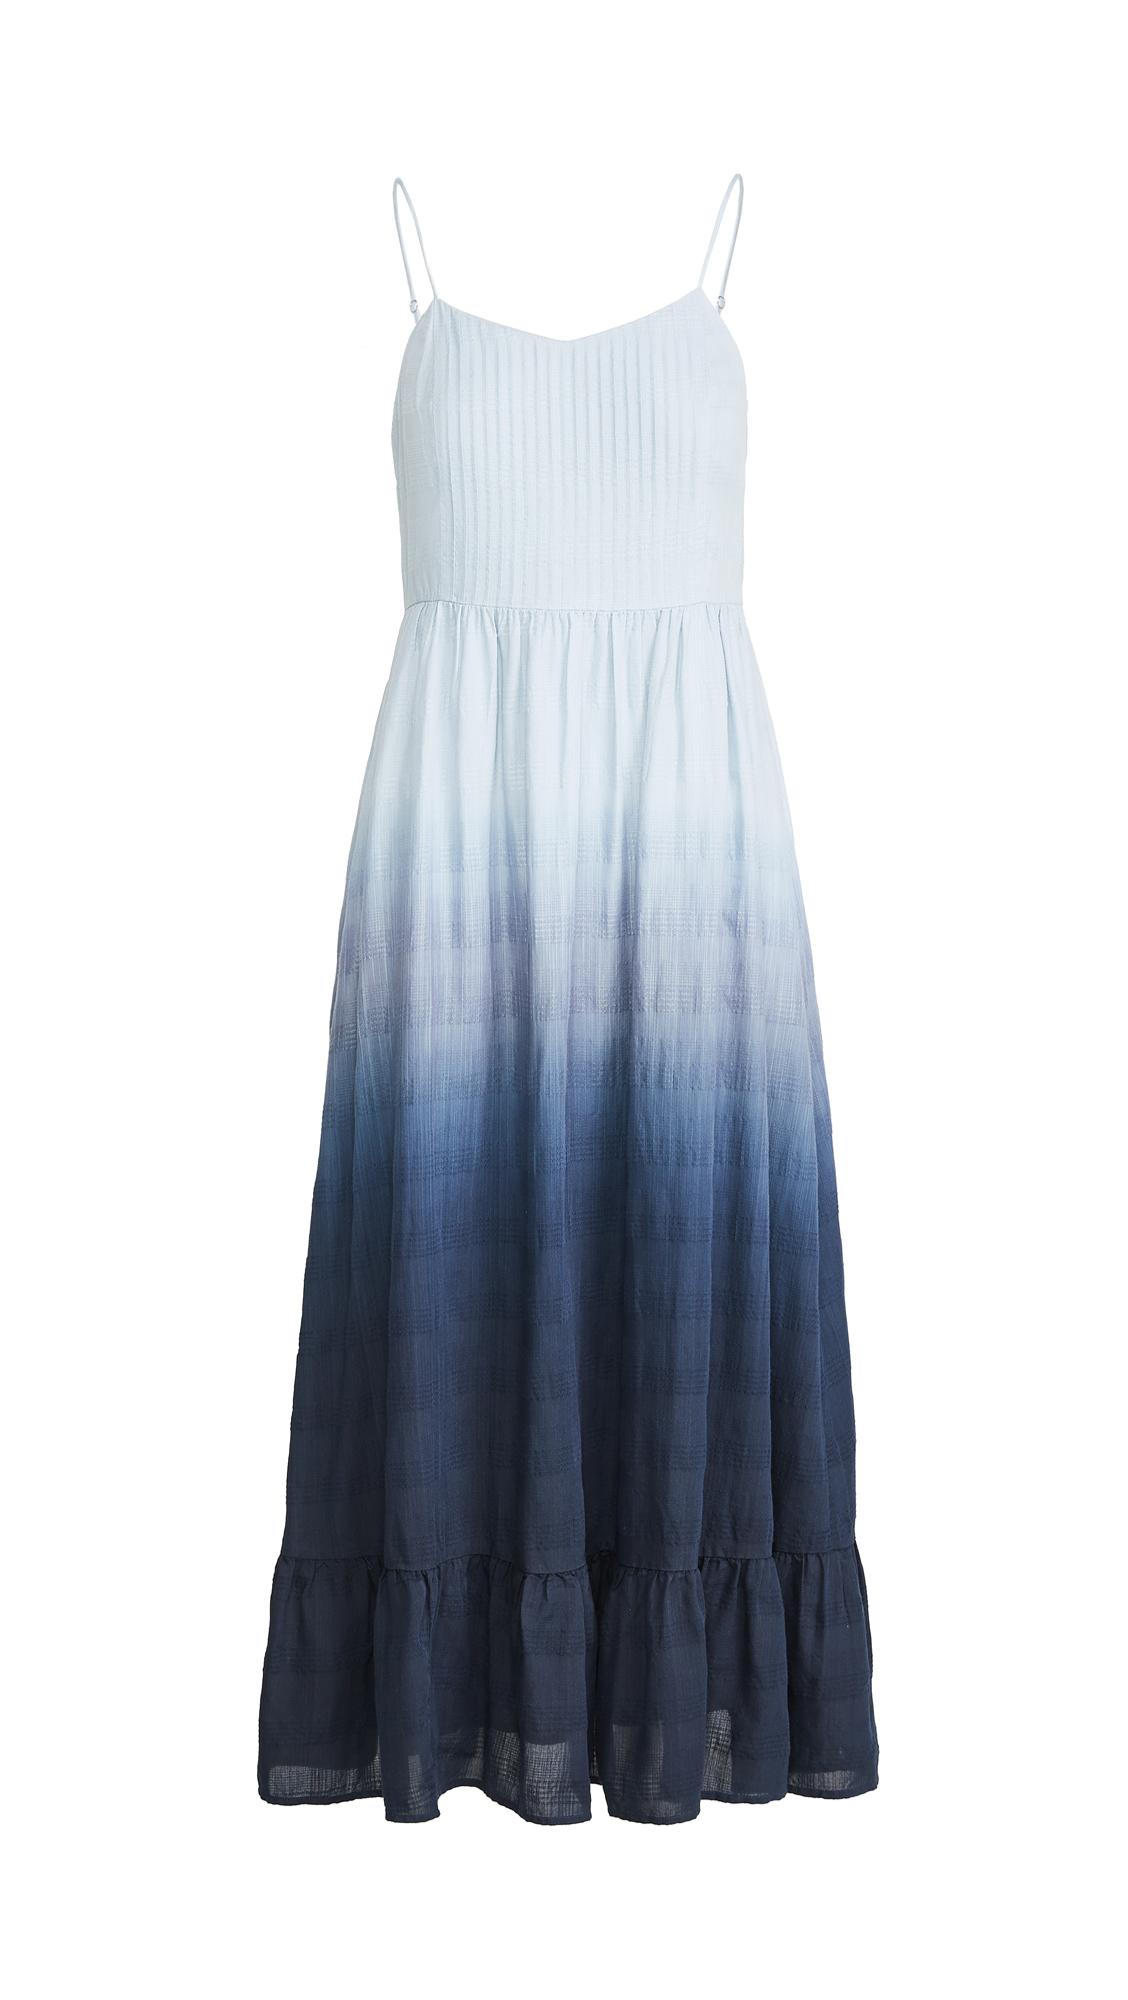 Madewell Cami Pintuck Midi Dress